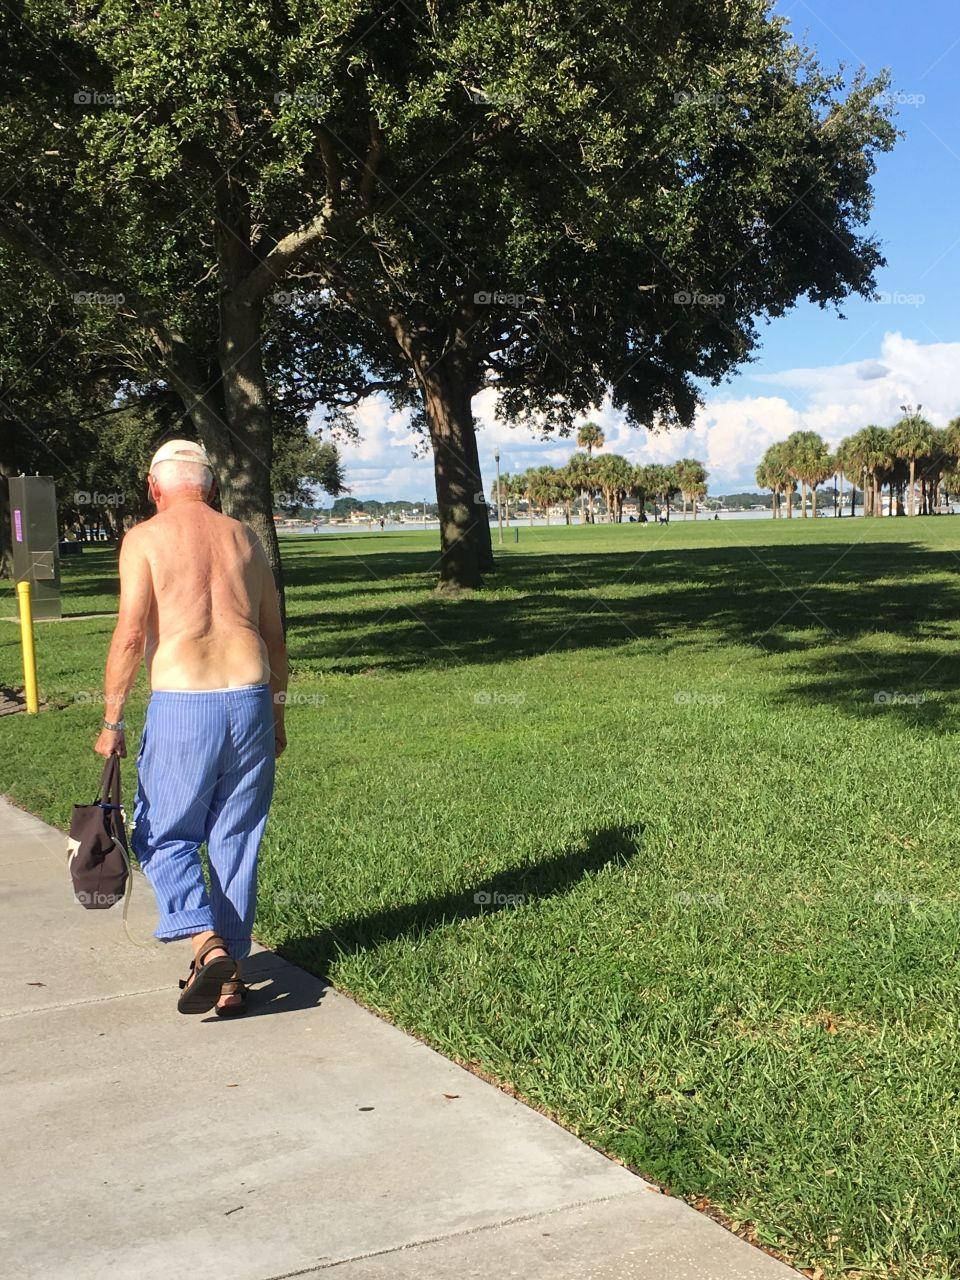 Topless grandpa with pj bottoms taking a walk